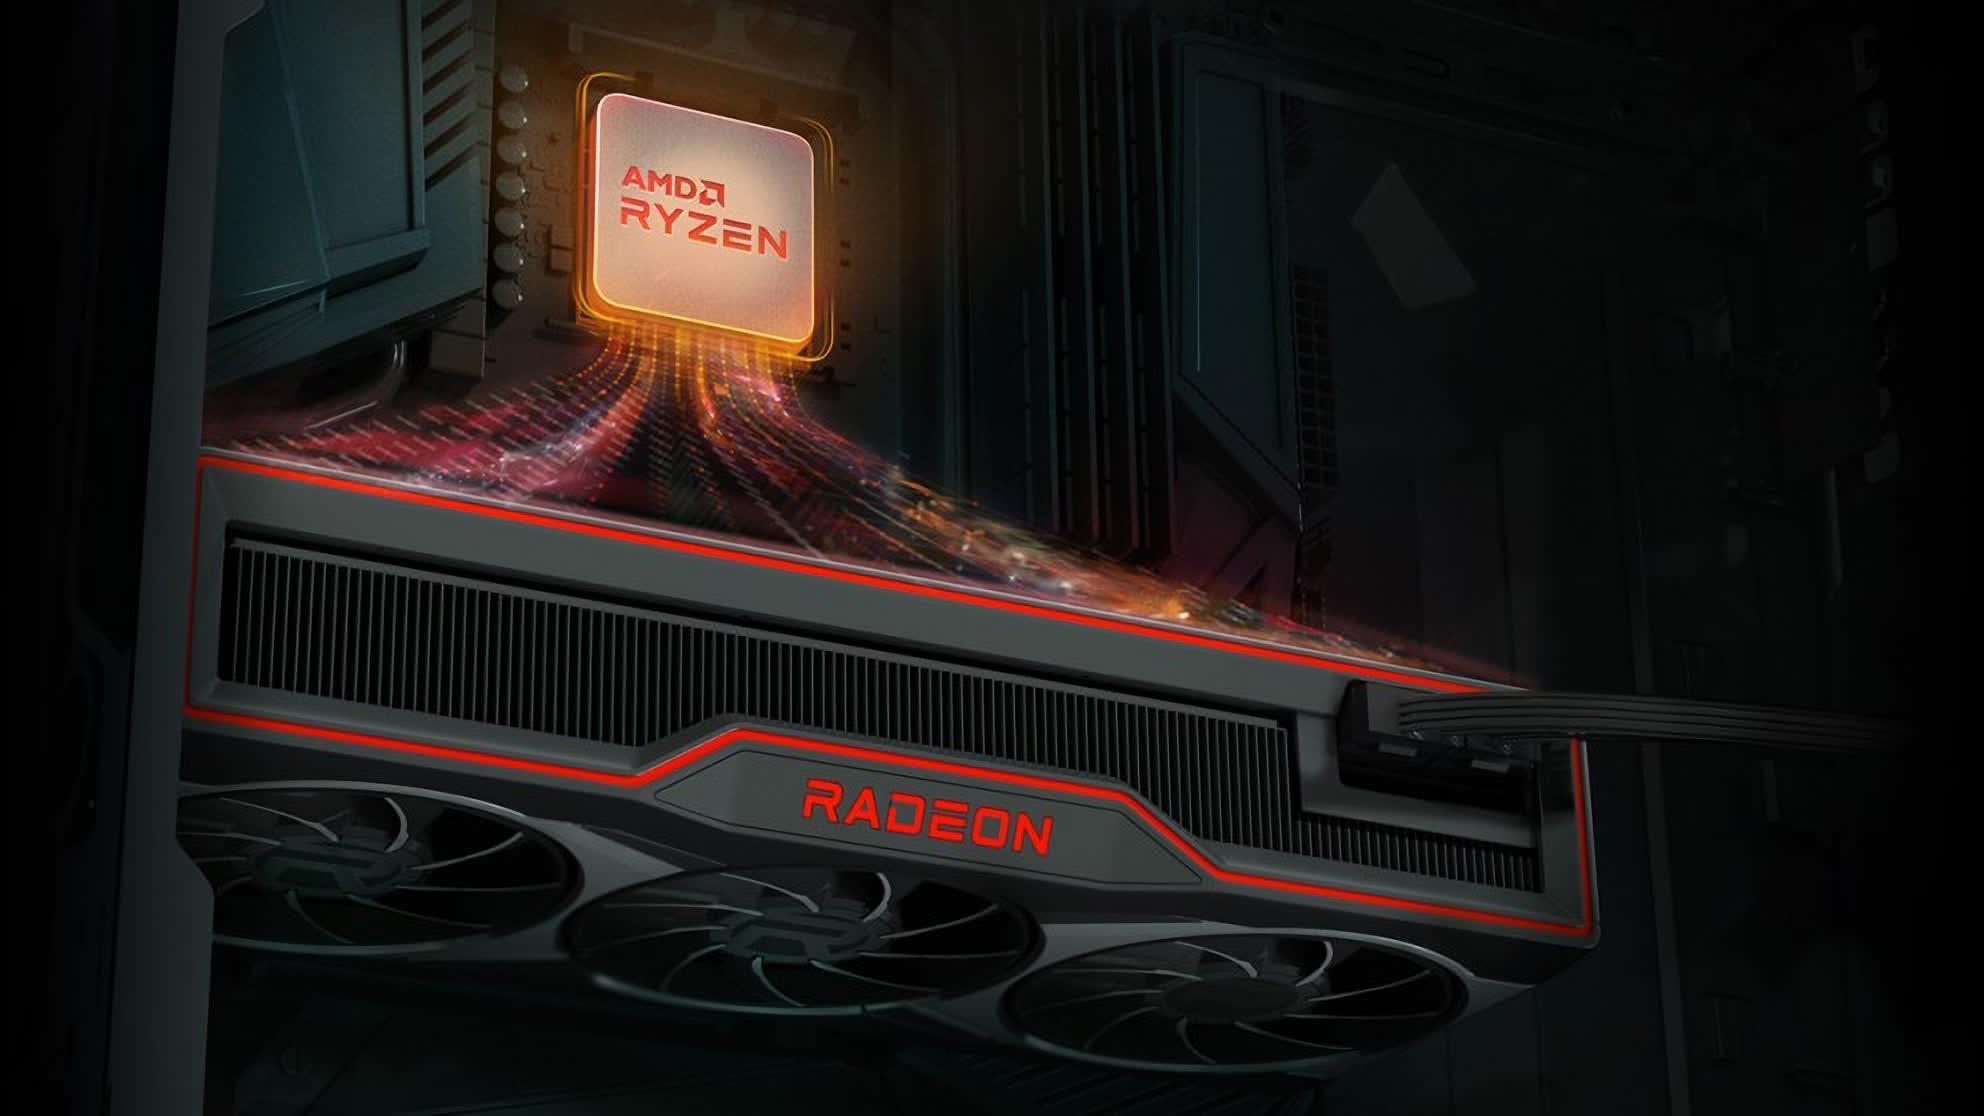 1631806976 485 AMD donnera la priorite aux CPU et GPU haut de